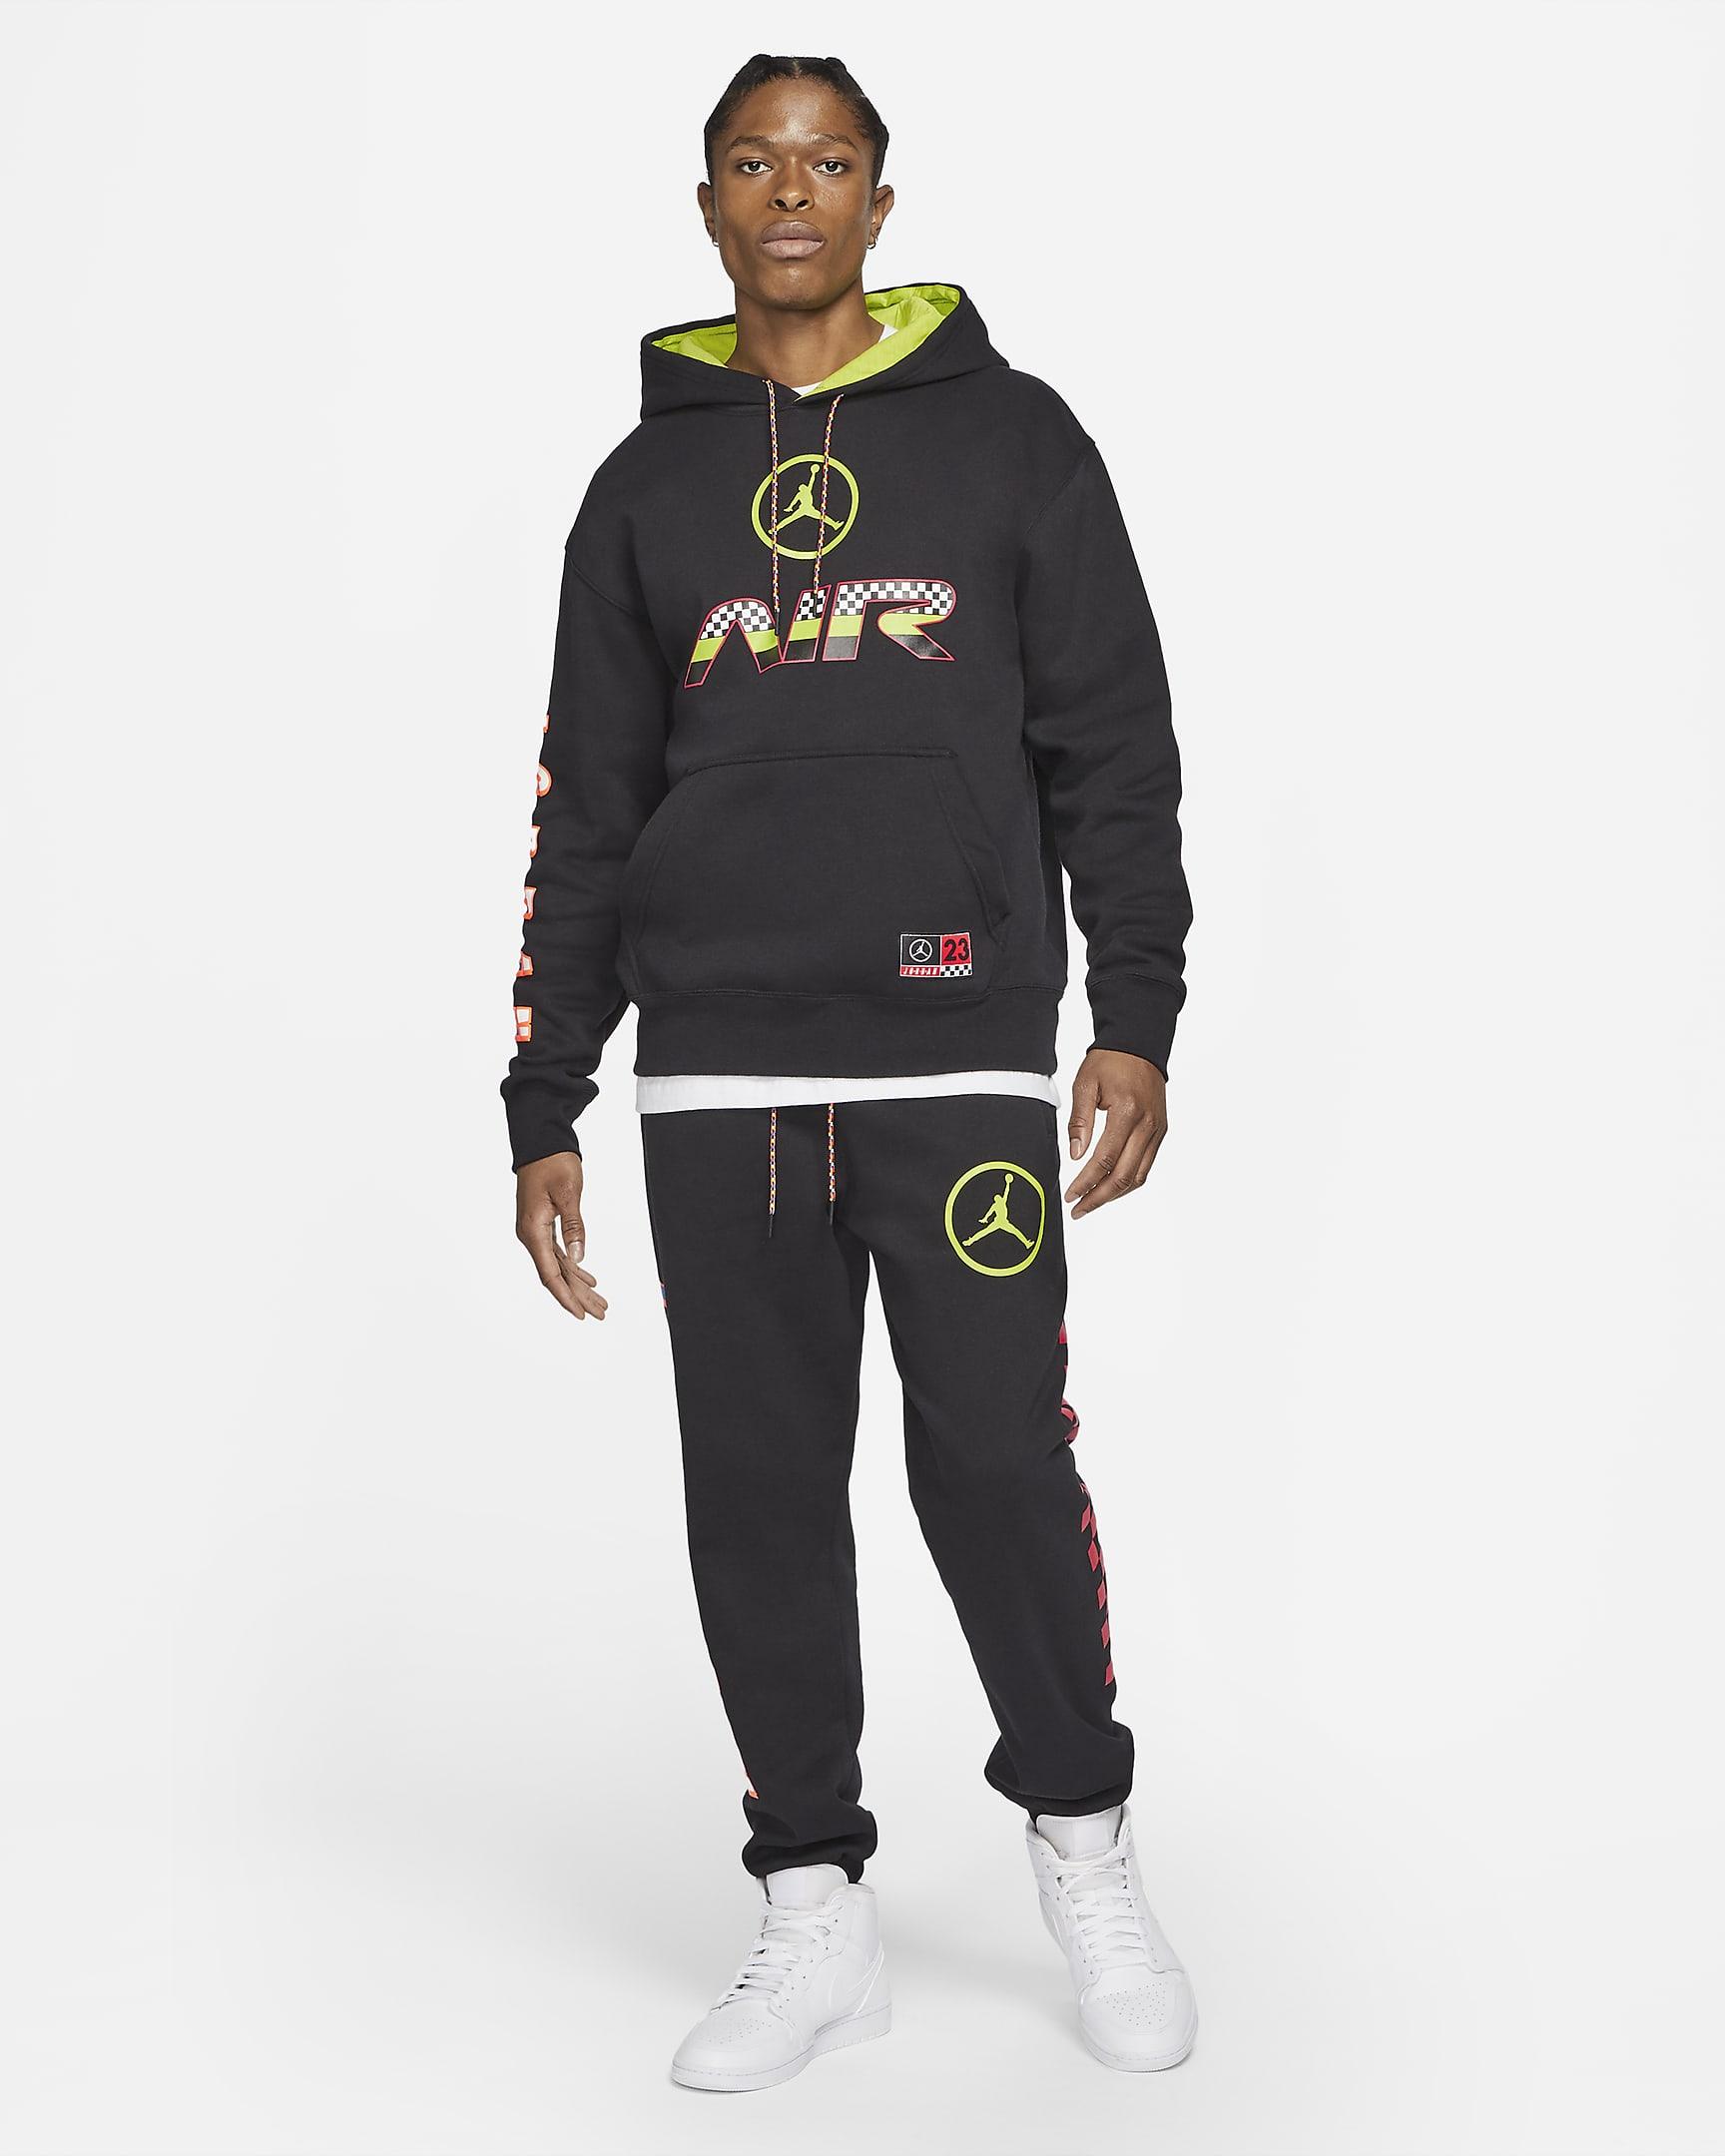 jordan-sport-dna-mens-hbr-pullover-hoodie-1SFRQ0-2